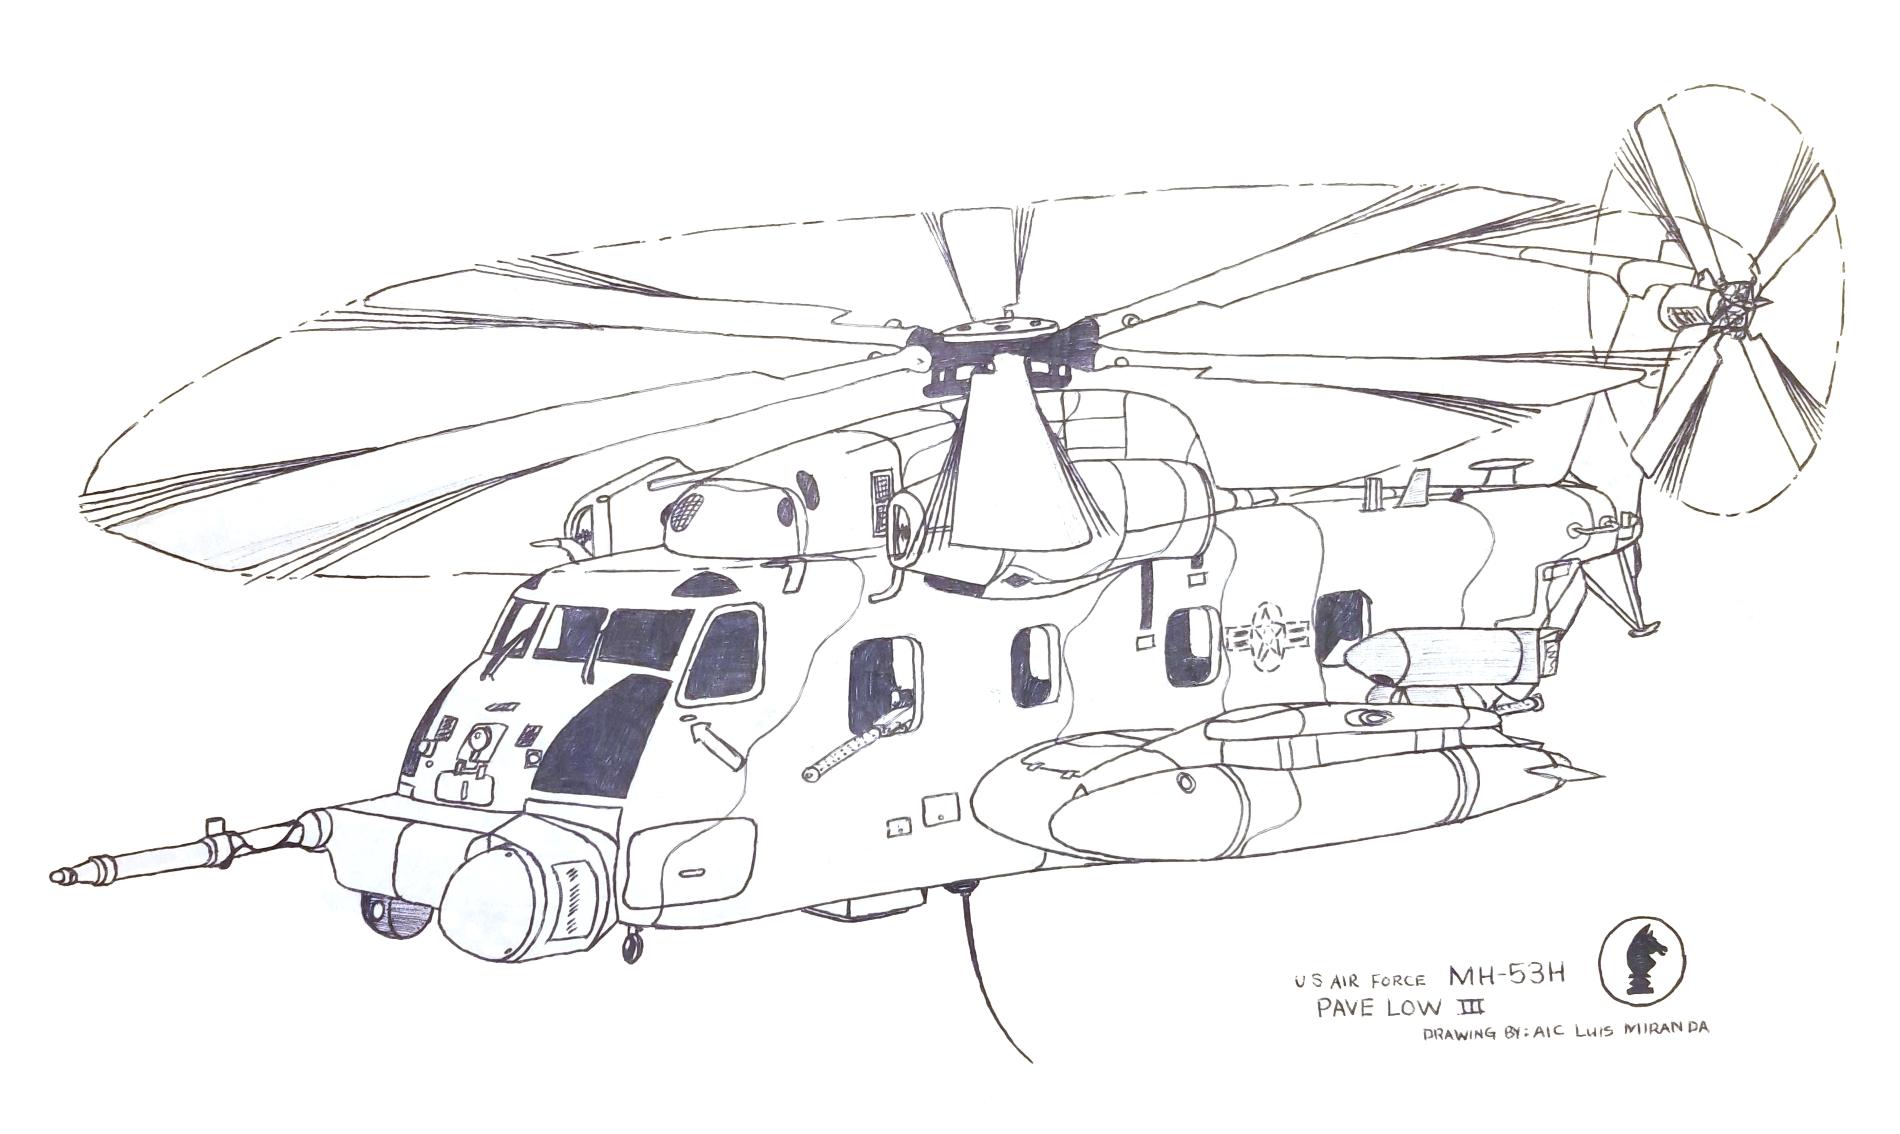 MH-53H Art Drawing